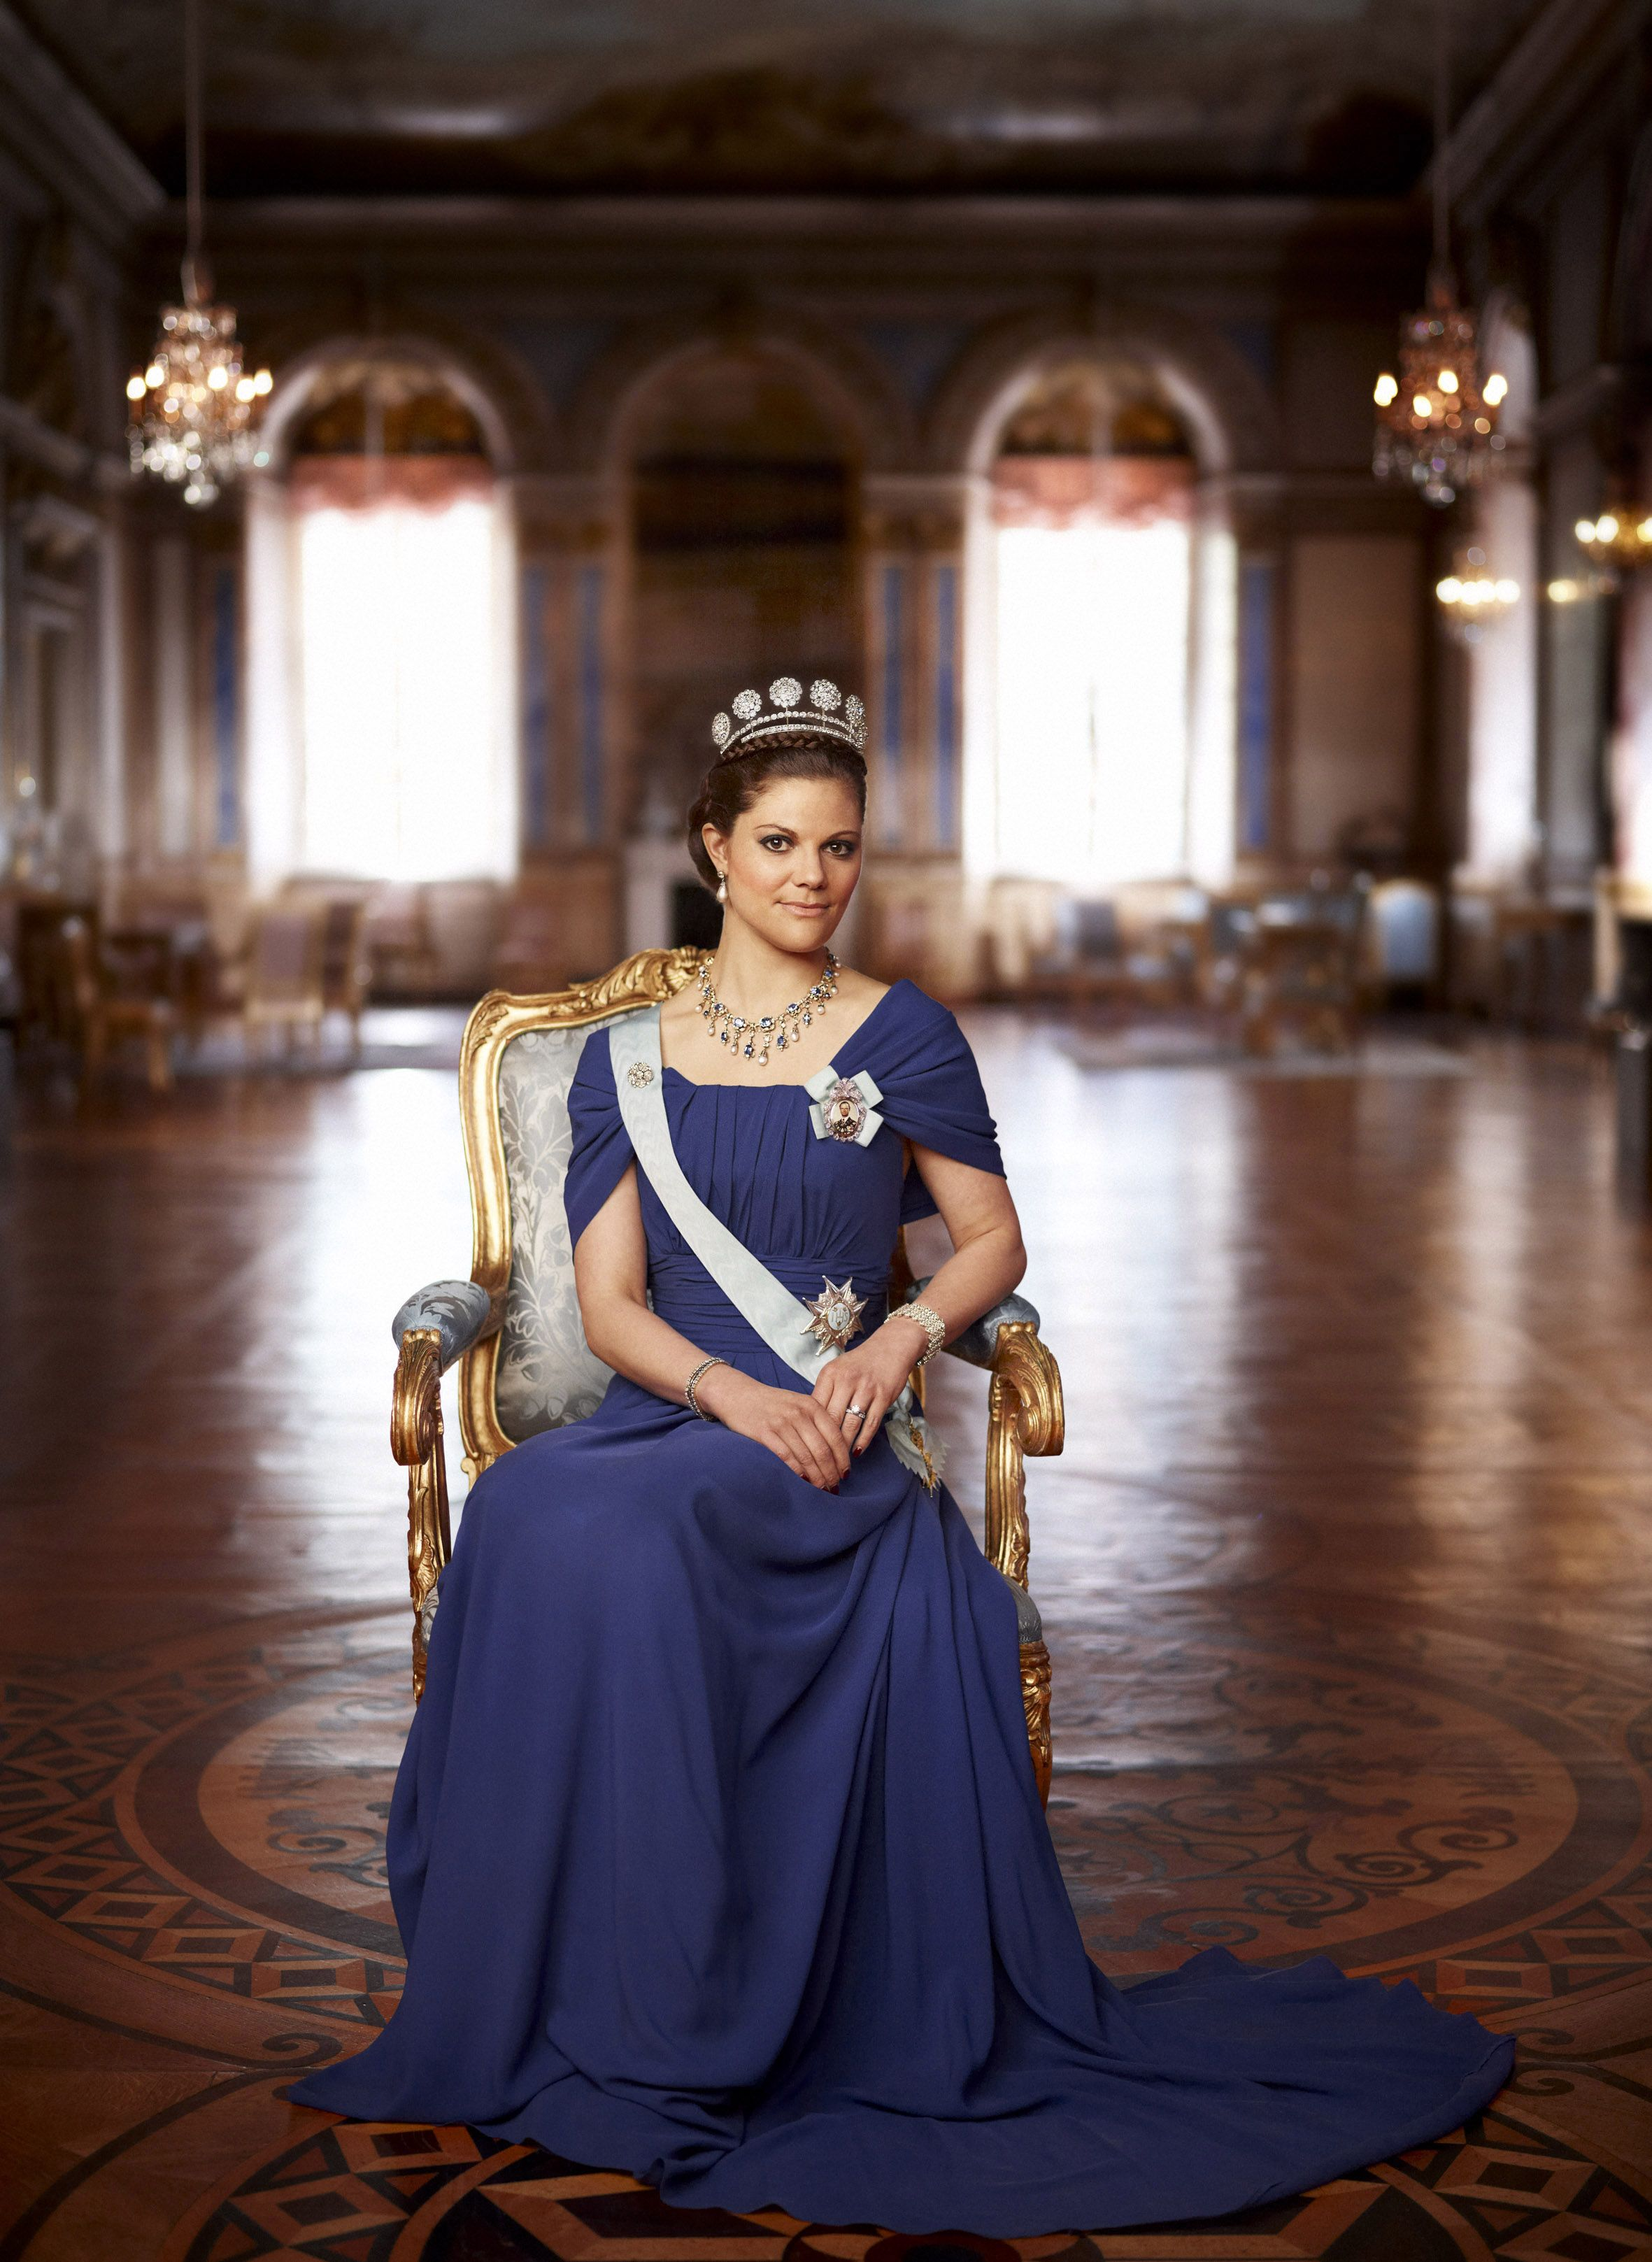 Royal Crown Princess Victoria of Sweden